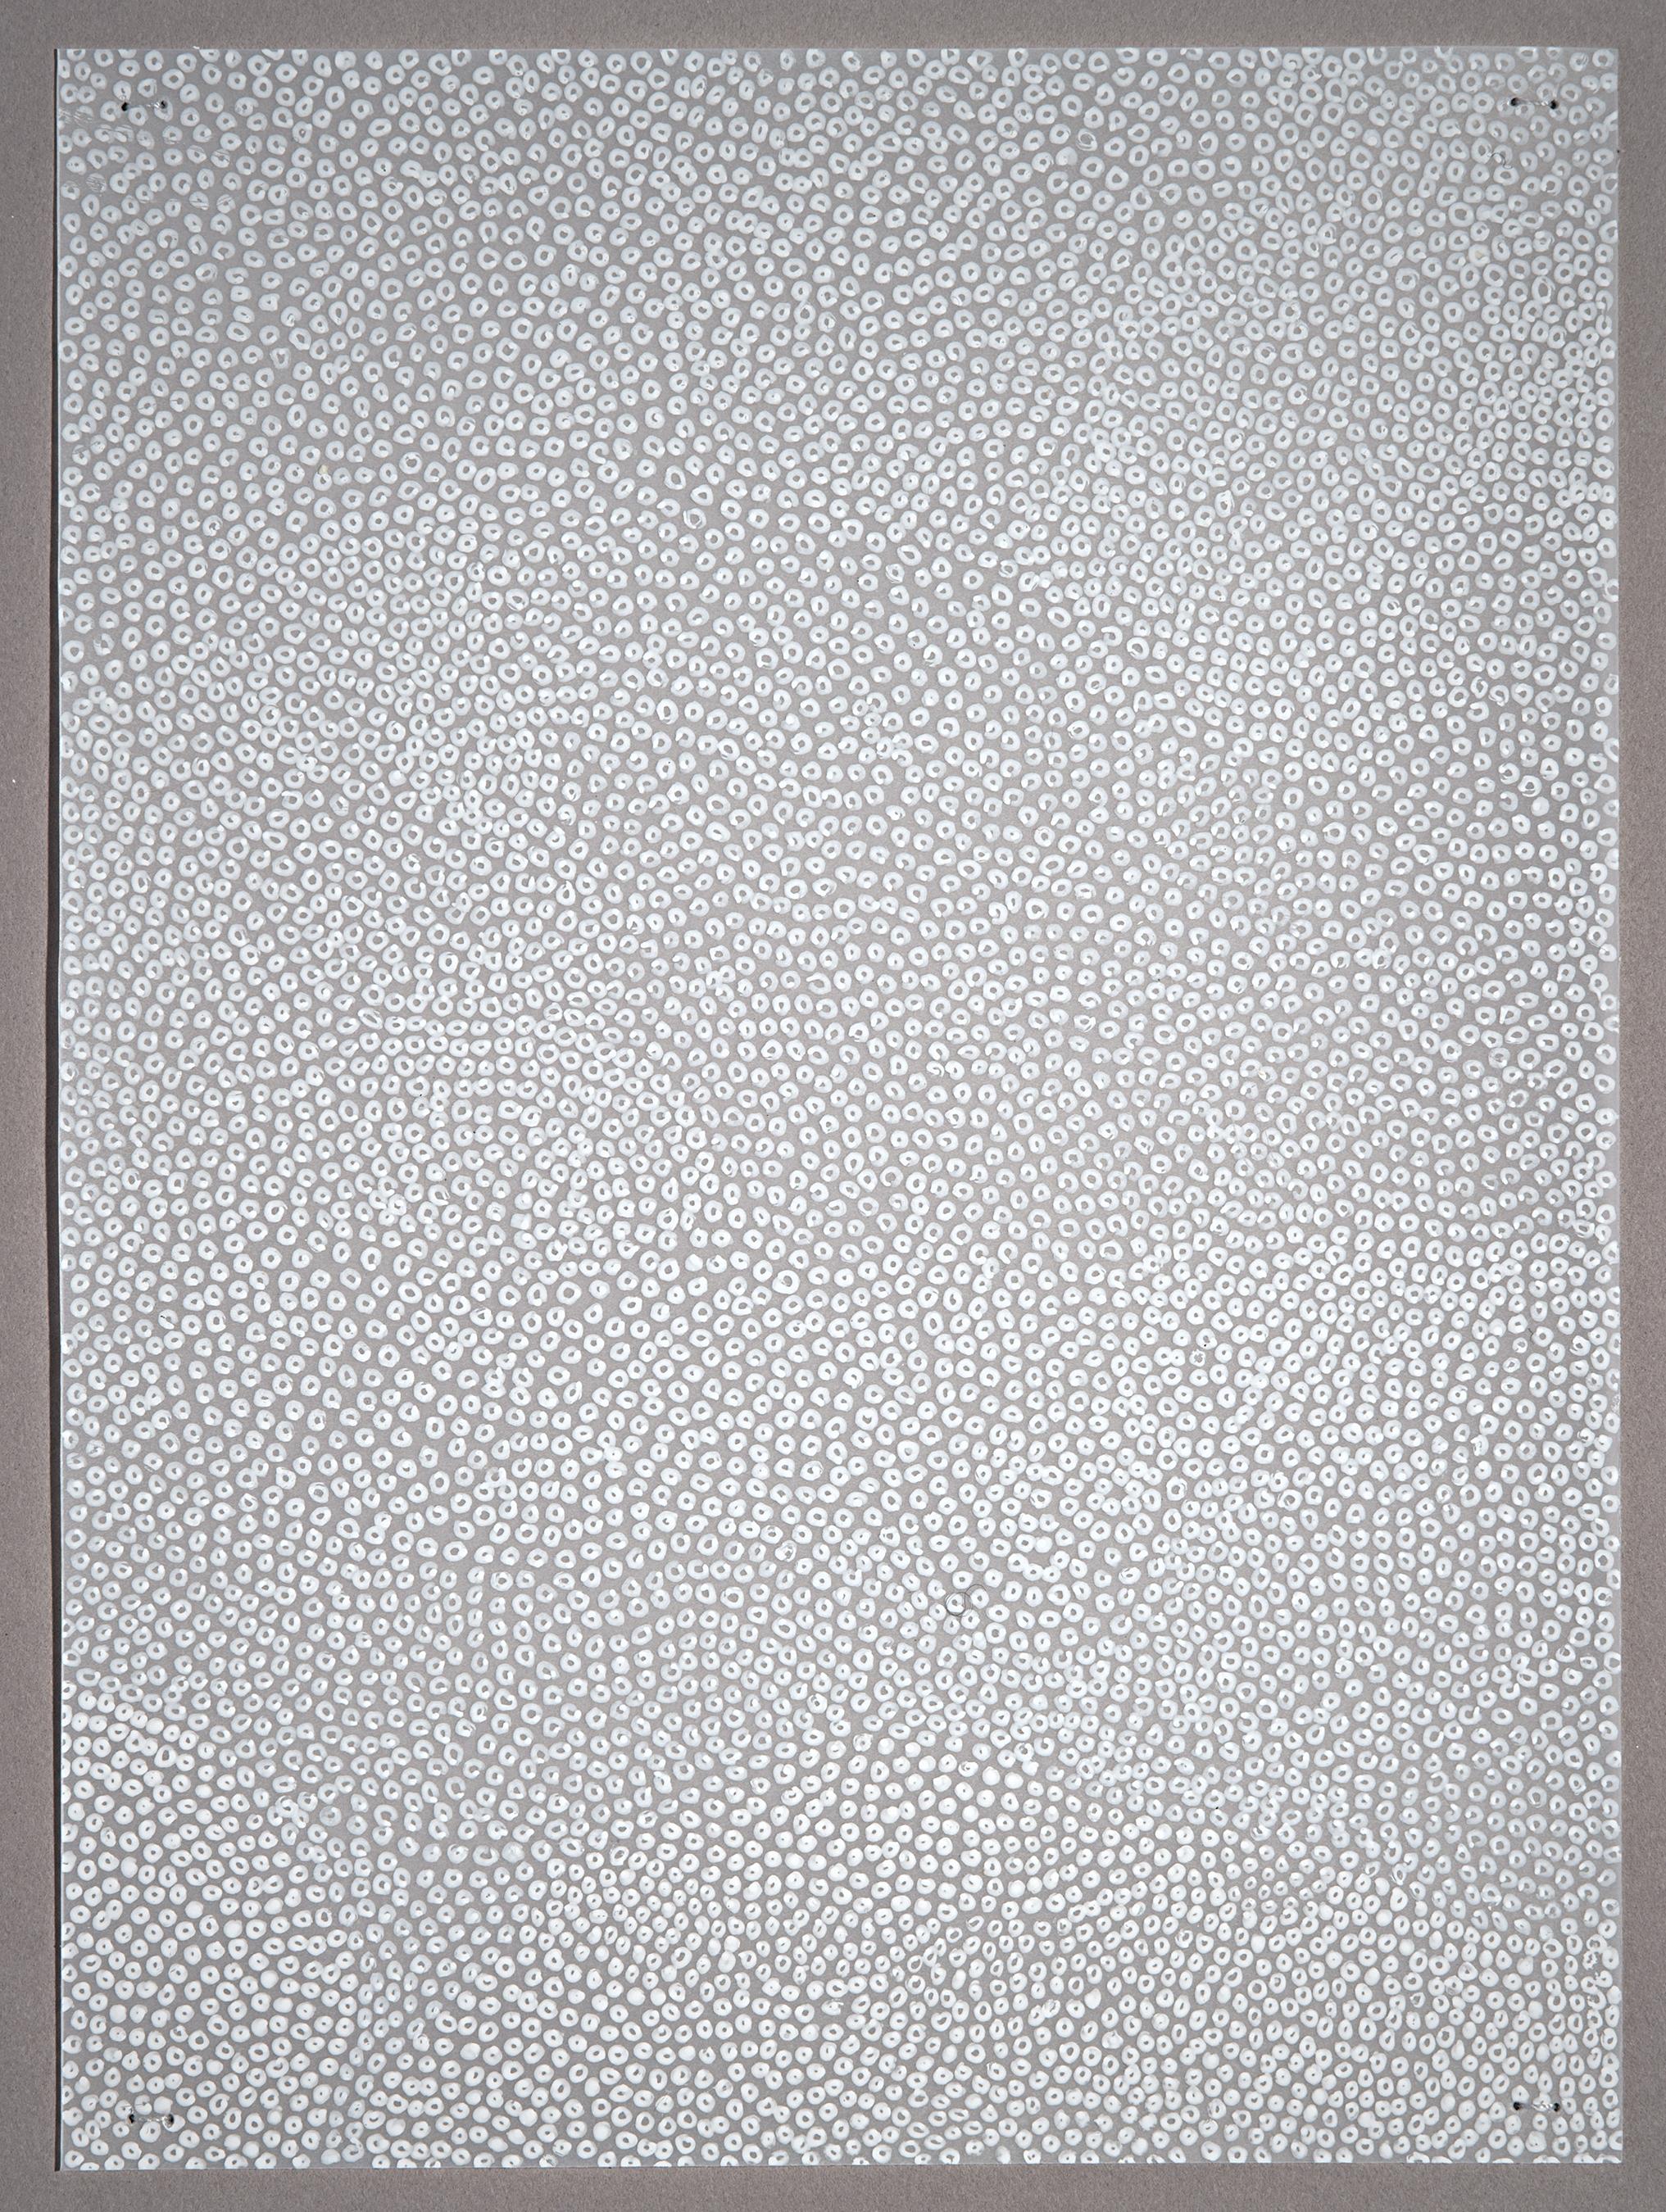 Dot.Field.sm.jpg